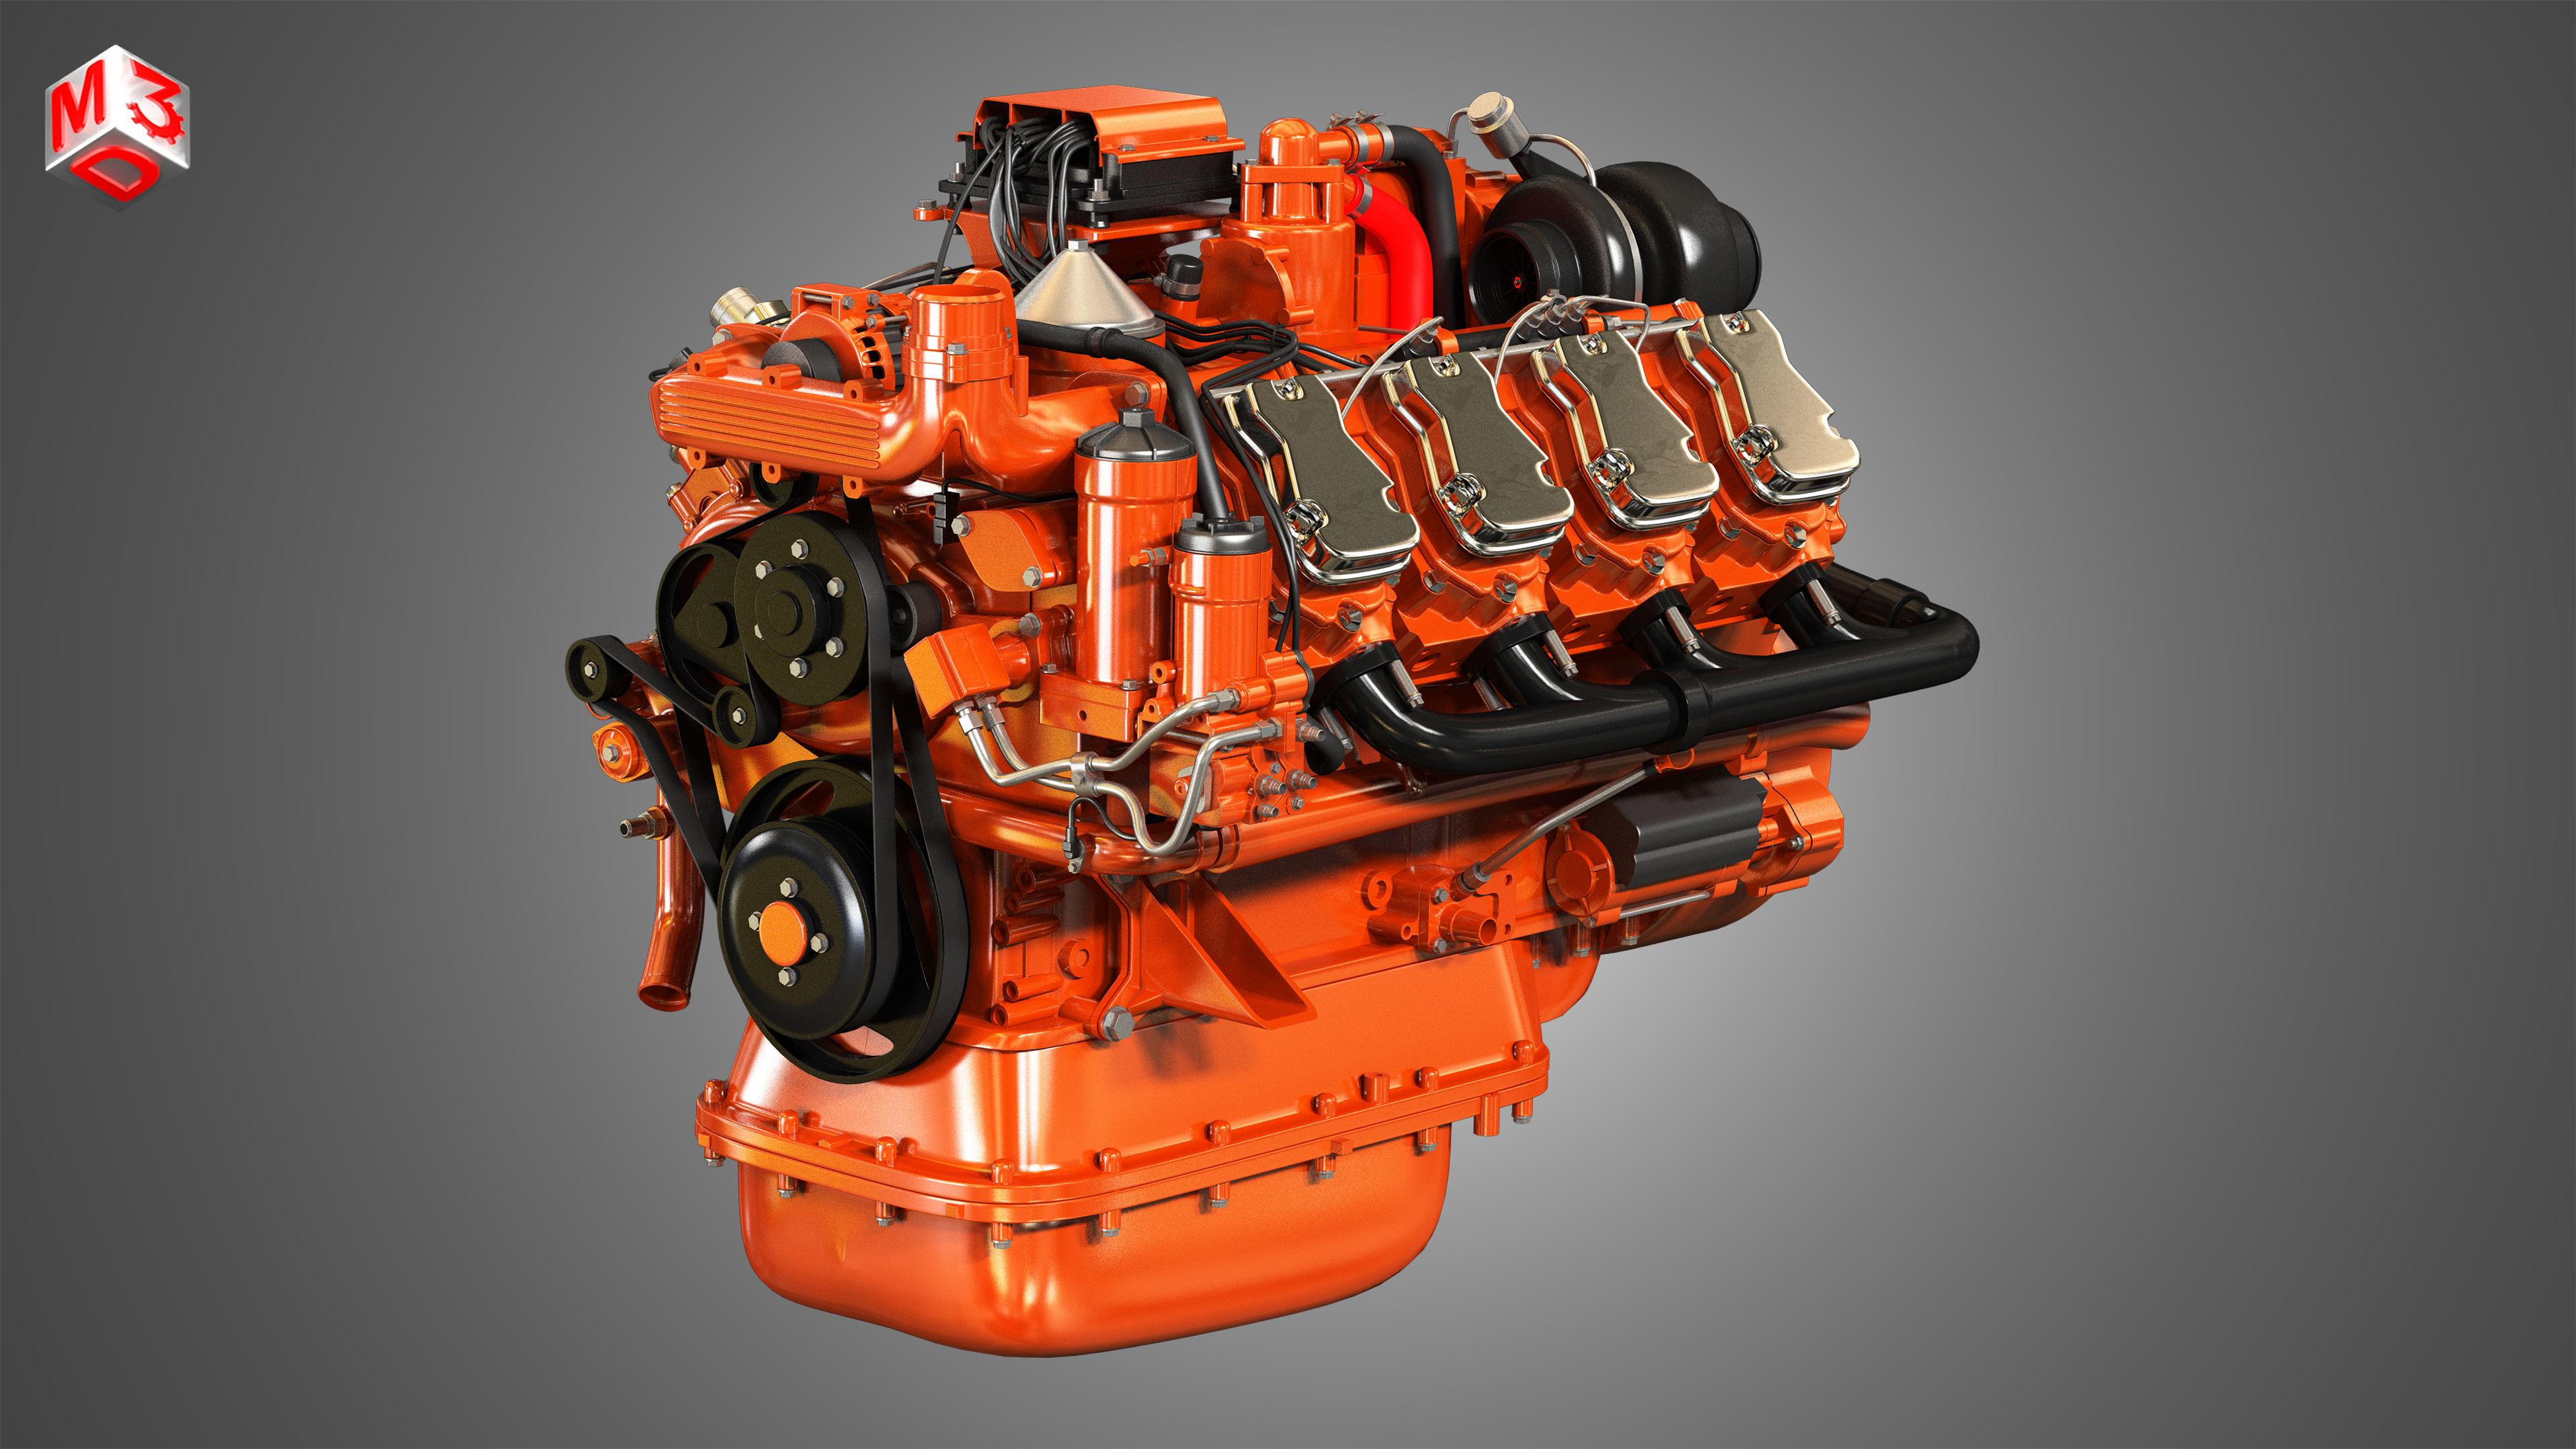 DC16 Truck Engine - V8 Diesel Engine